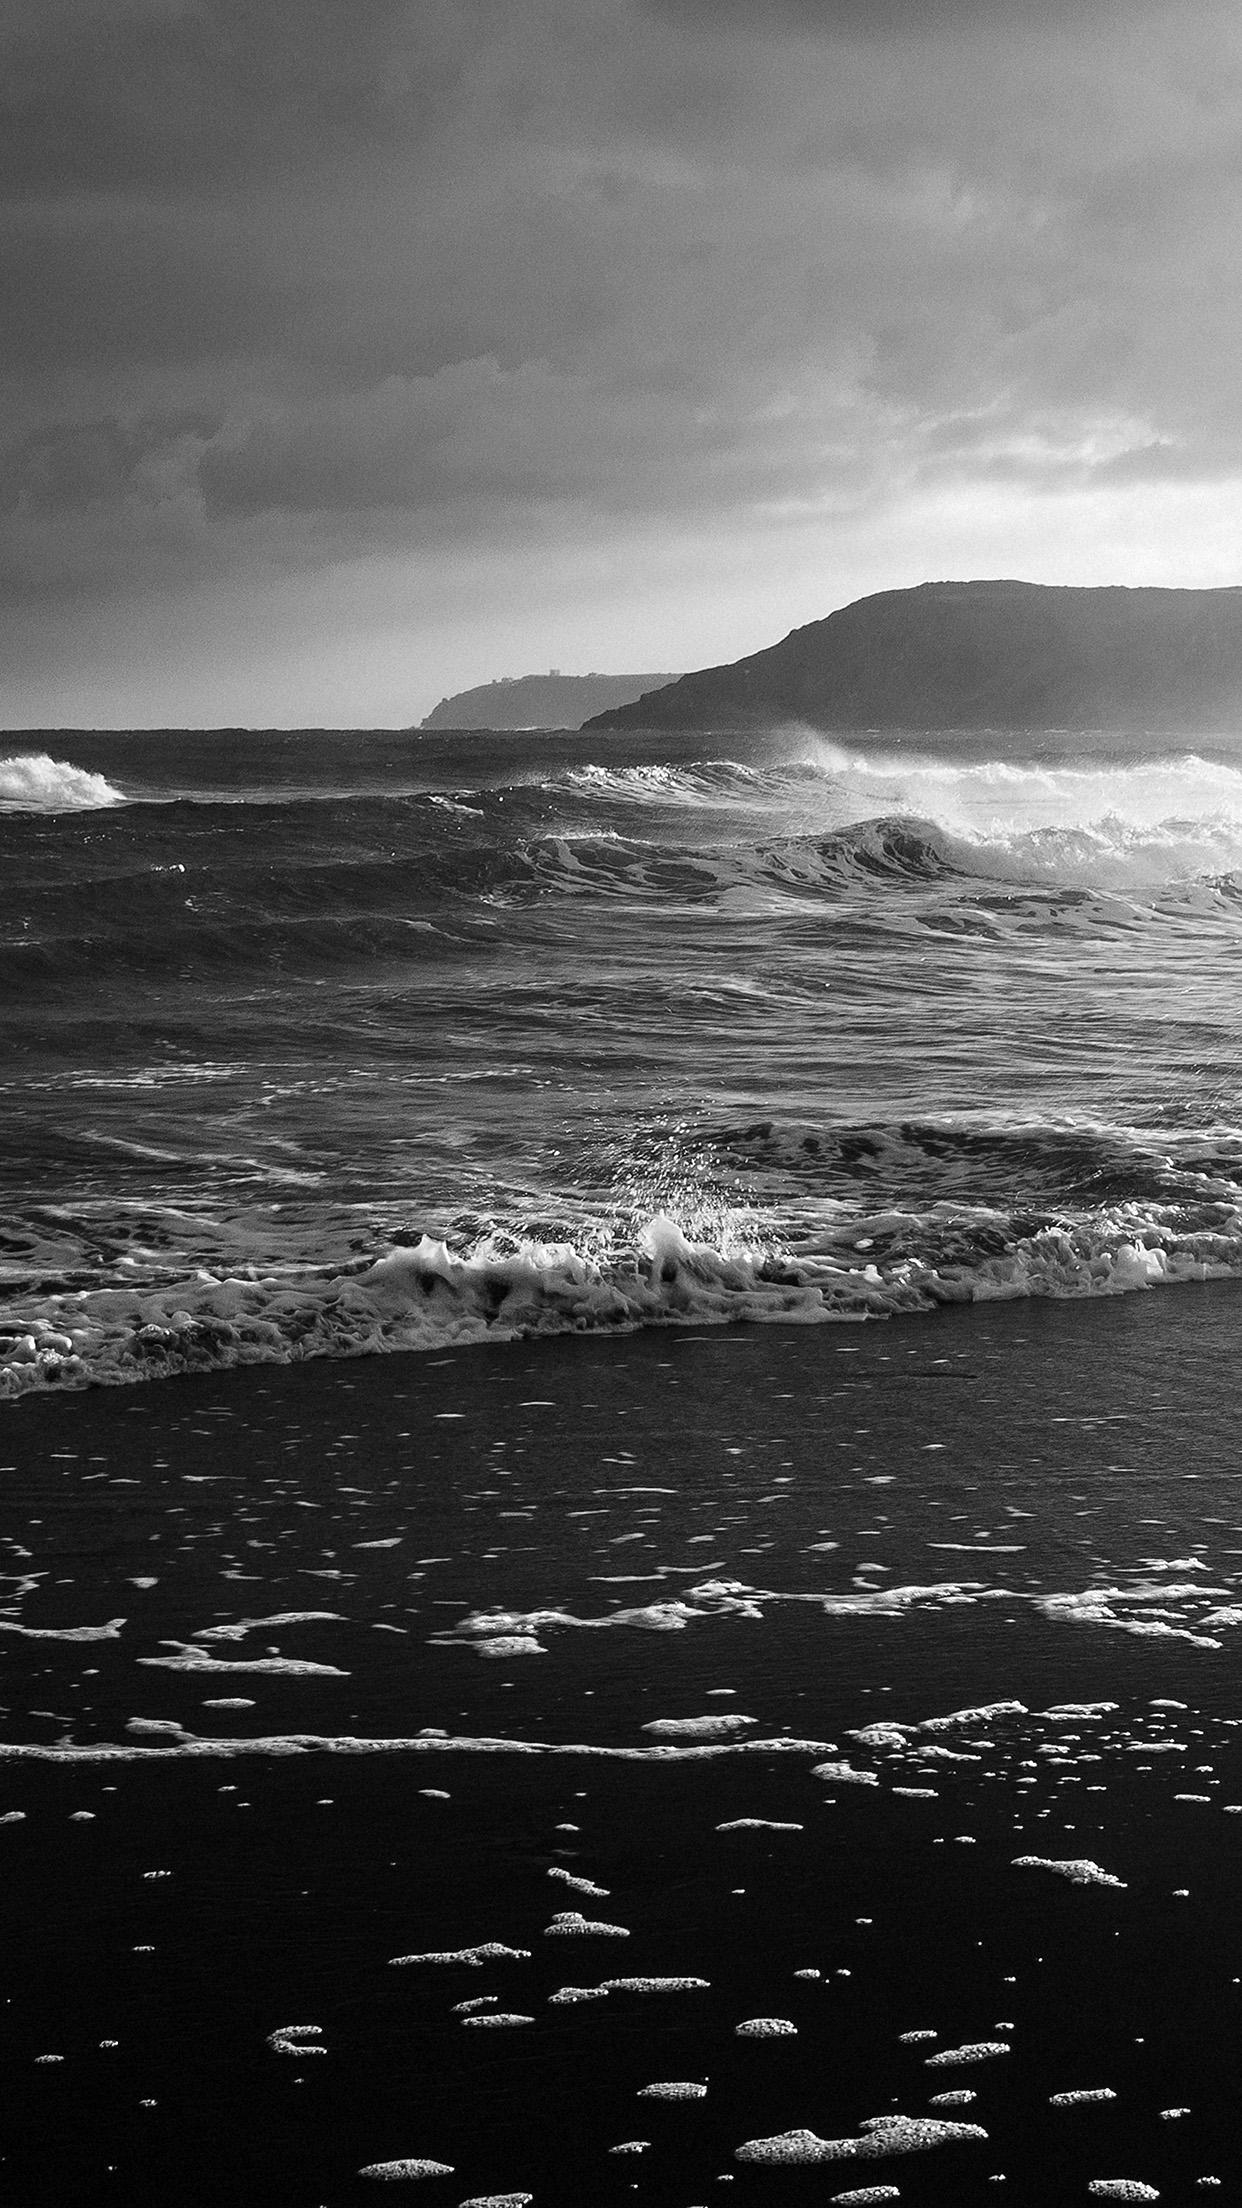 Ocean Waves Iphone Wallpaper Mt68 Beach Costal Nature Sea Water Summer Bw Summer Flare